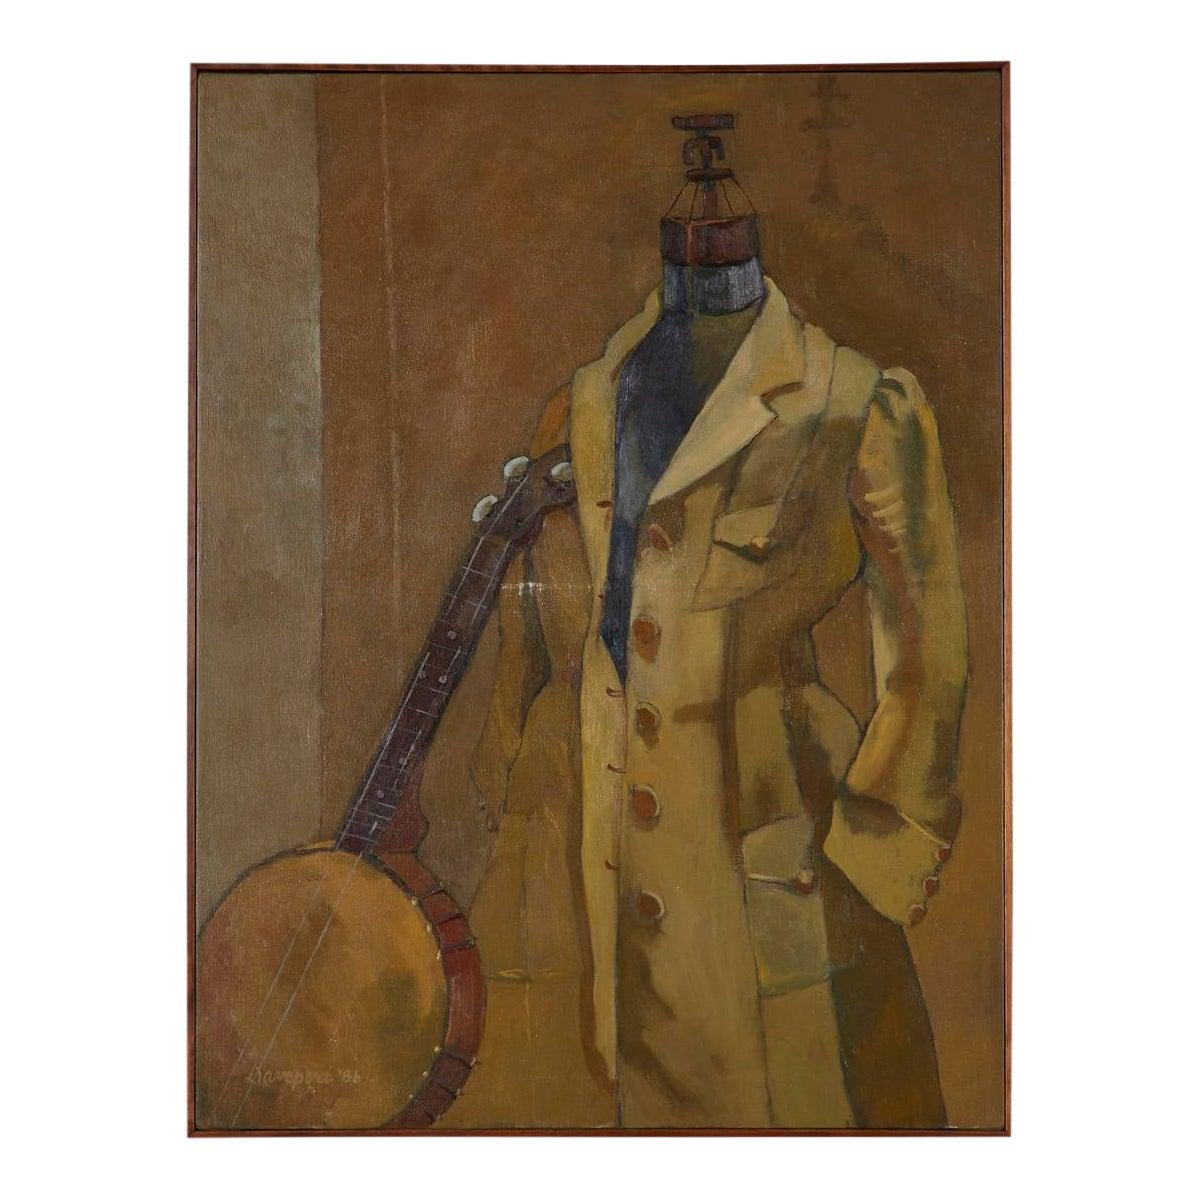 Banjo Player Still Life Painting